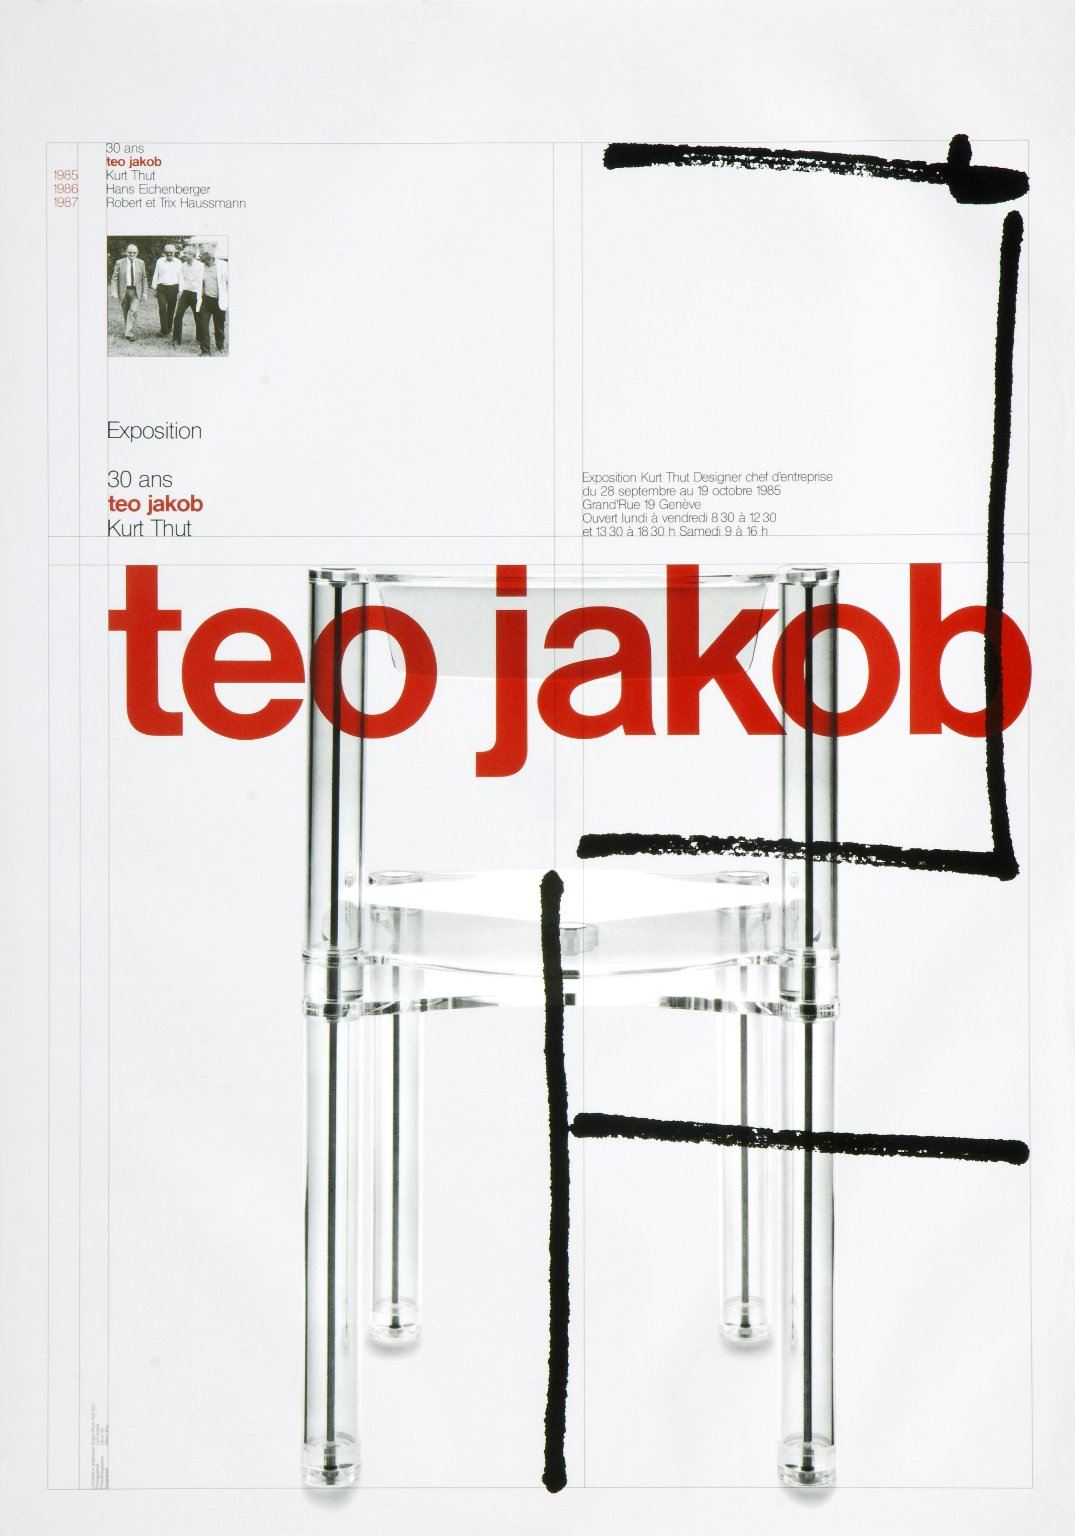 30 ans Teo Jakob: Kurt Thut